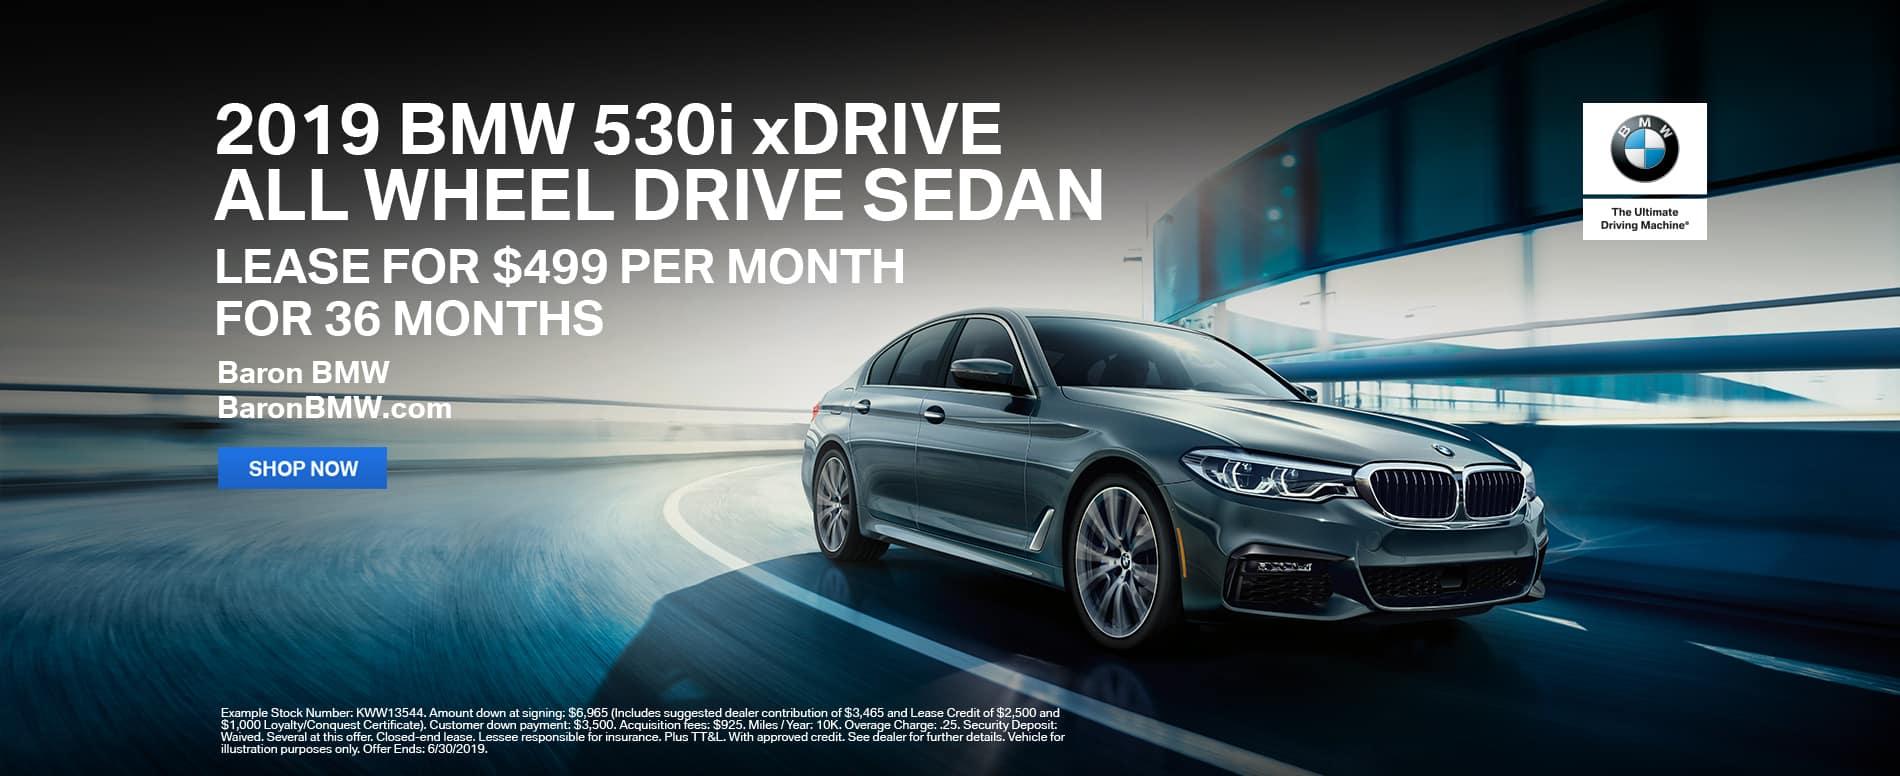 lease-2019-bmw-530i-xdrive-awd-sedan-baron